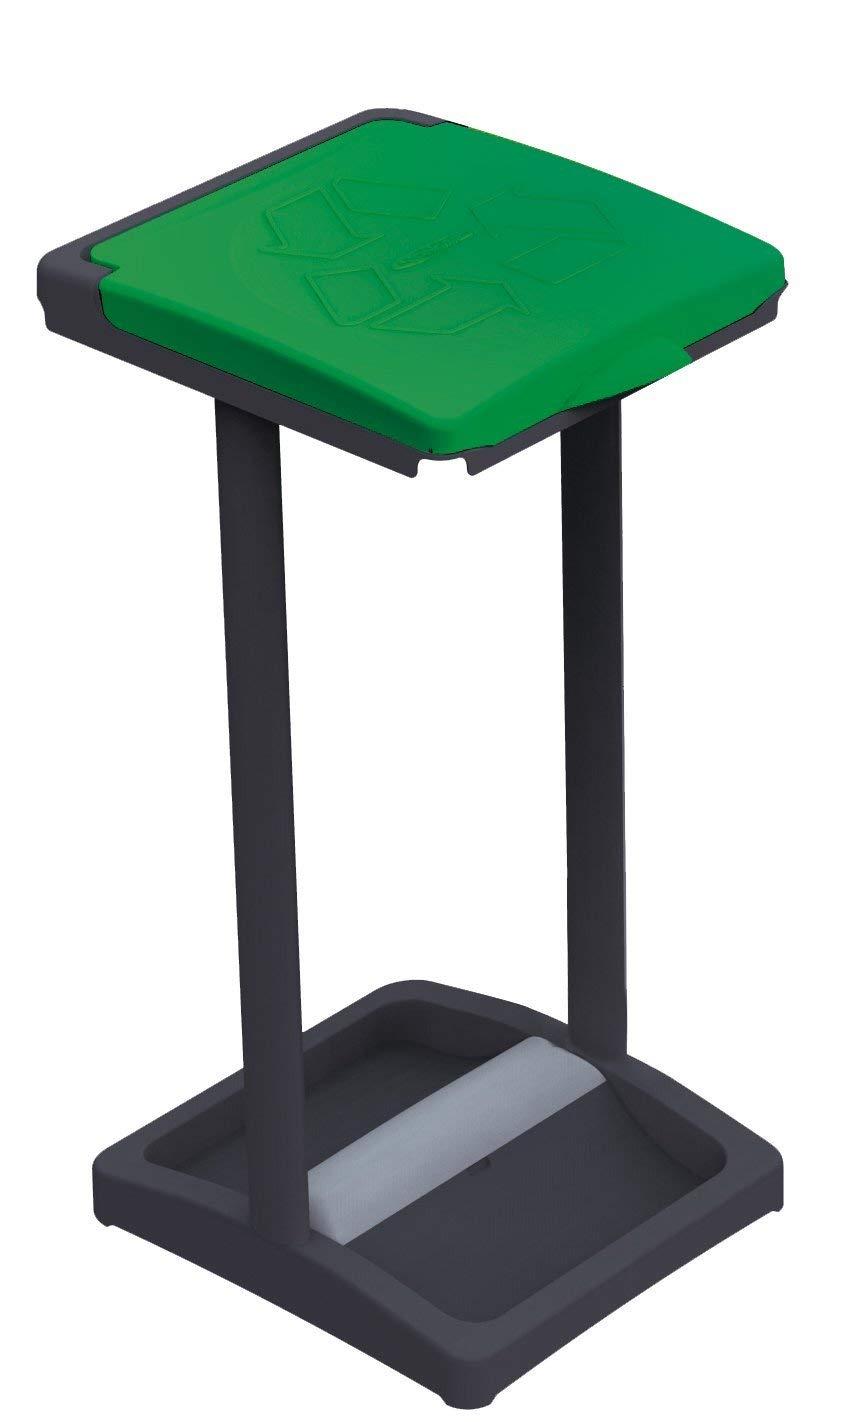 Mongarid New Mister B Single Waste Bag Holder Fabric Green One Size